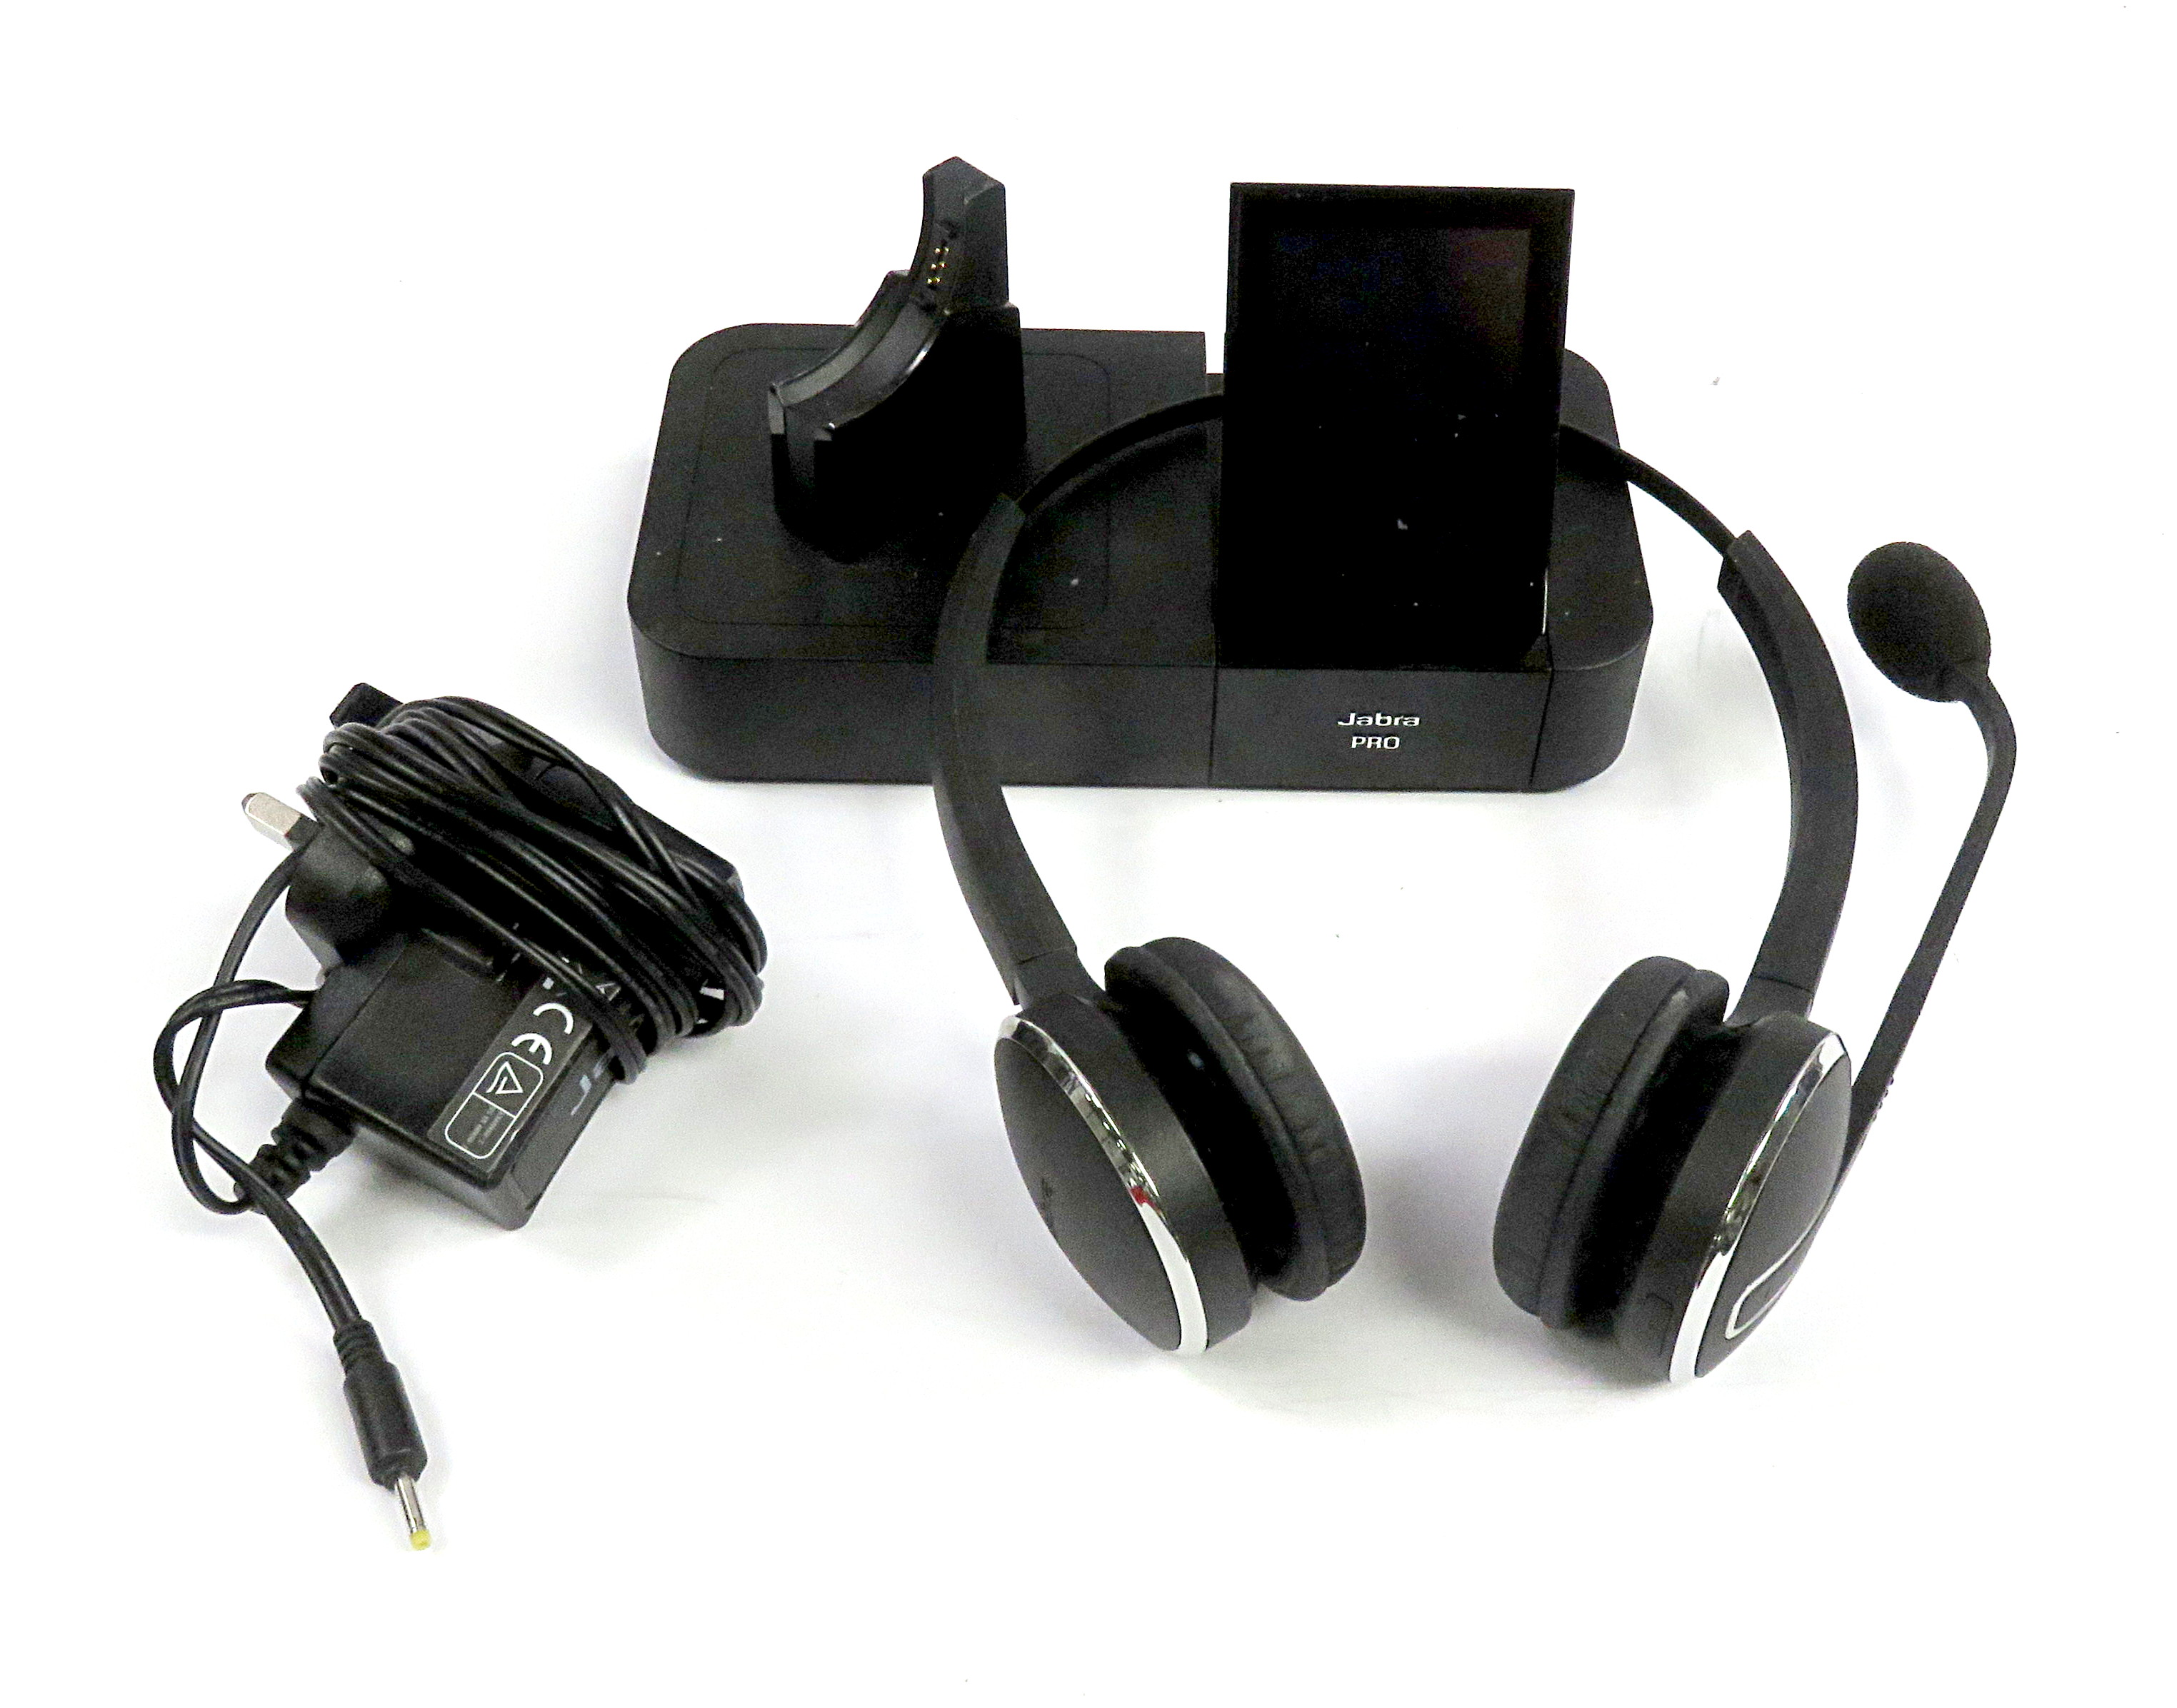 Jabra PRO 9470 Duo DECT Wireless Telephony System w/ Stereo Headset & PSU